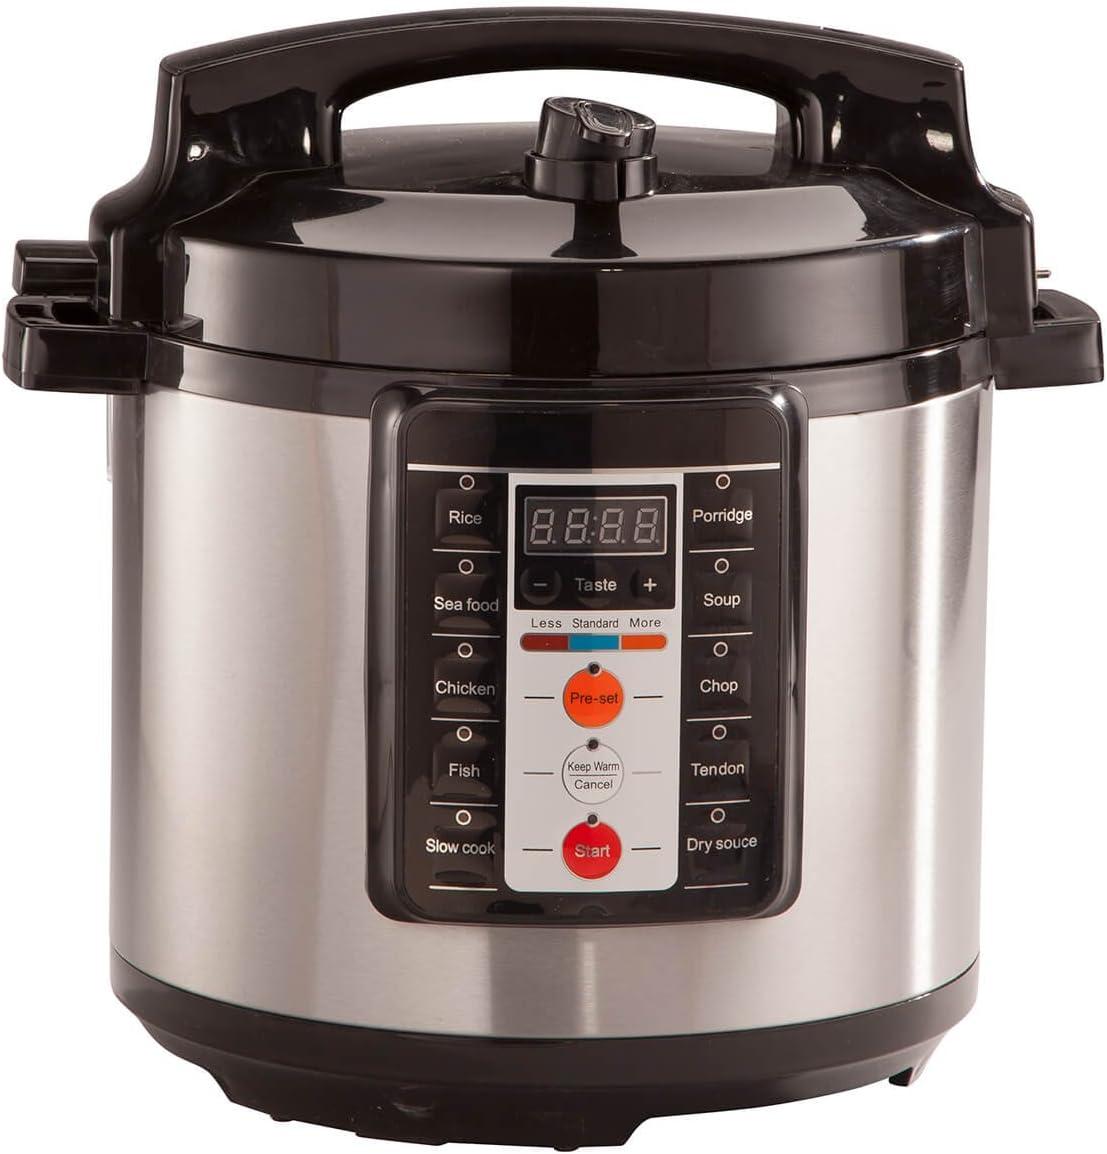 7-in-1 Austin Mall Multi-Function Electric Pressure Import Quart 6.5 Cooker Pot